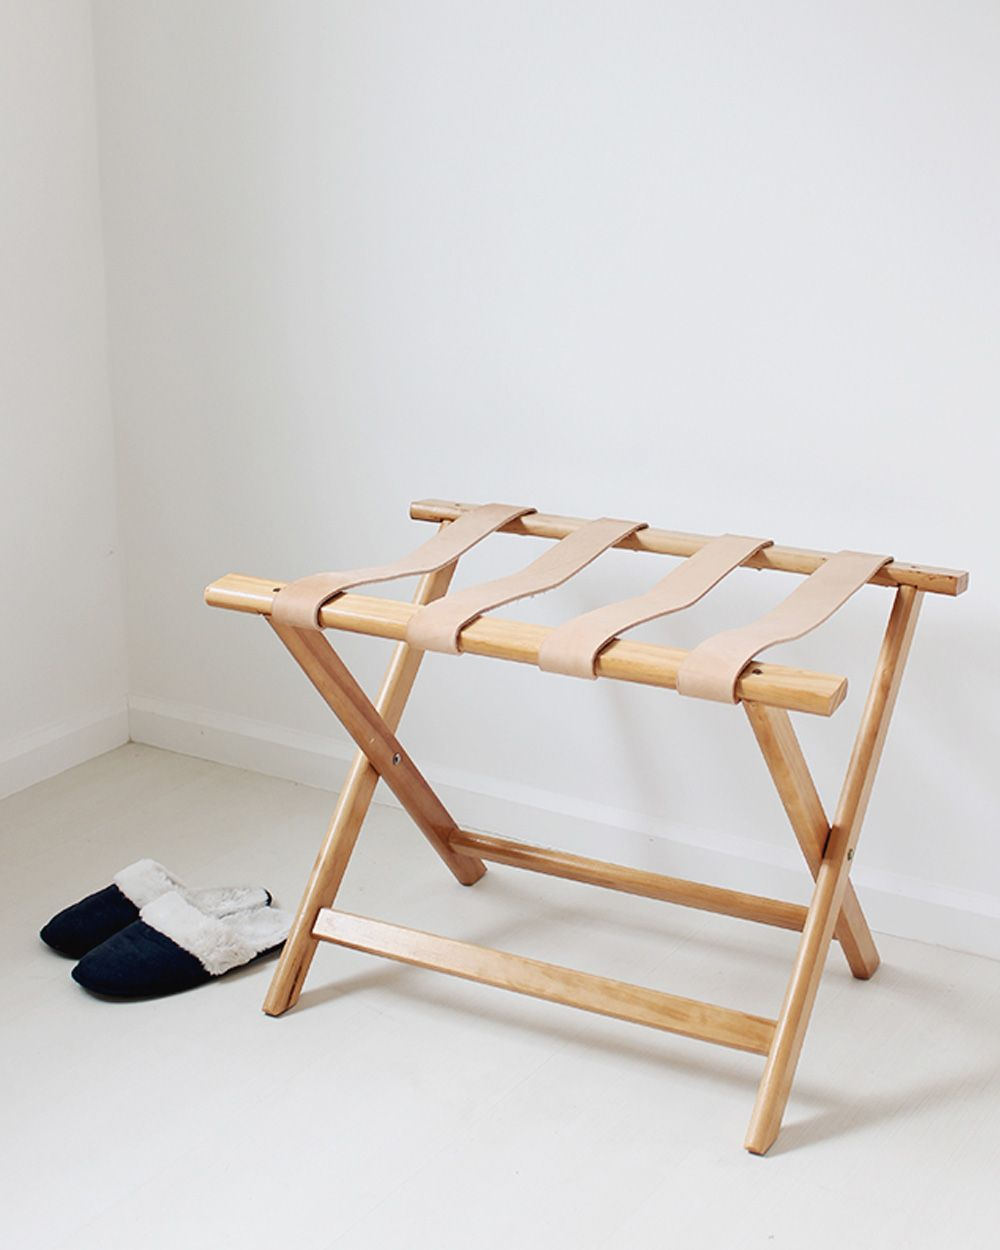 9 id es diy rep r es sur pinterest porte valise objet deco et valises. Black Bedroom Furniture Sets. Home Design Ideas